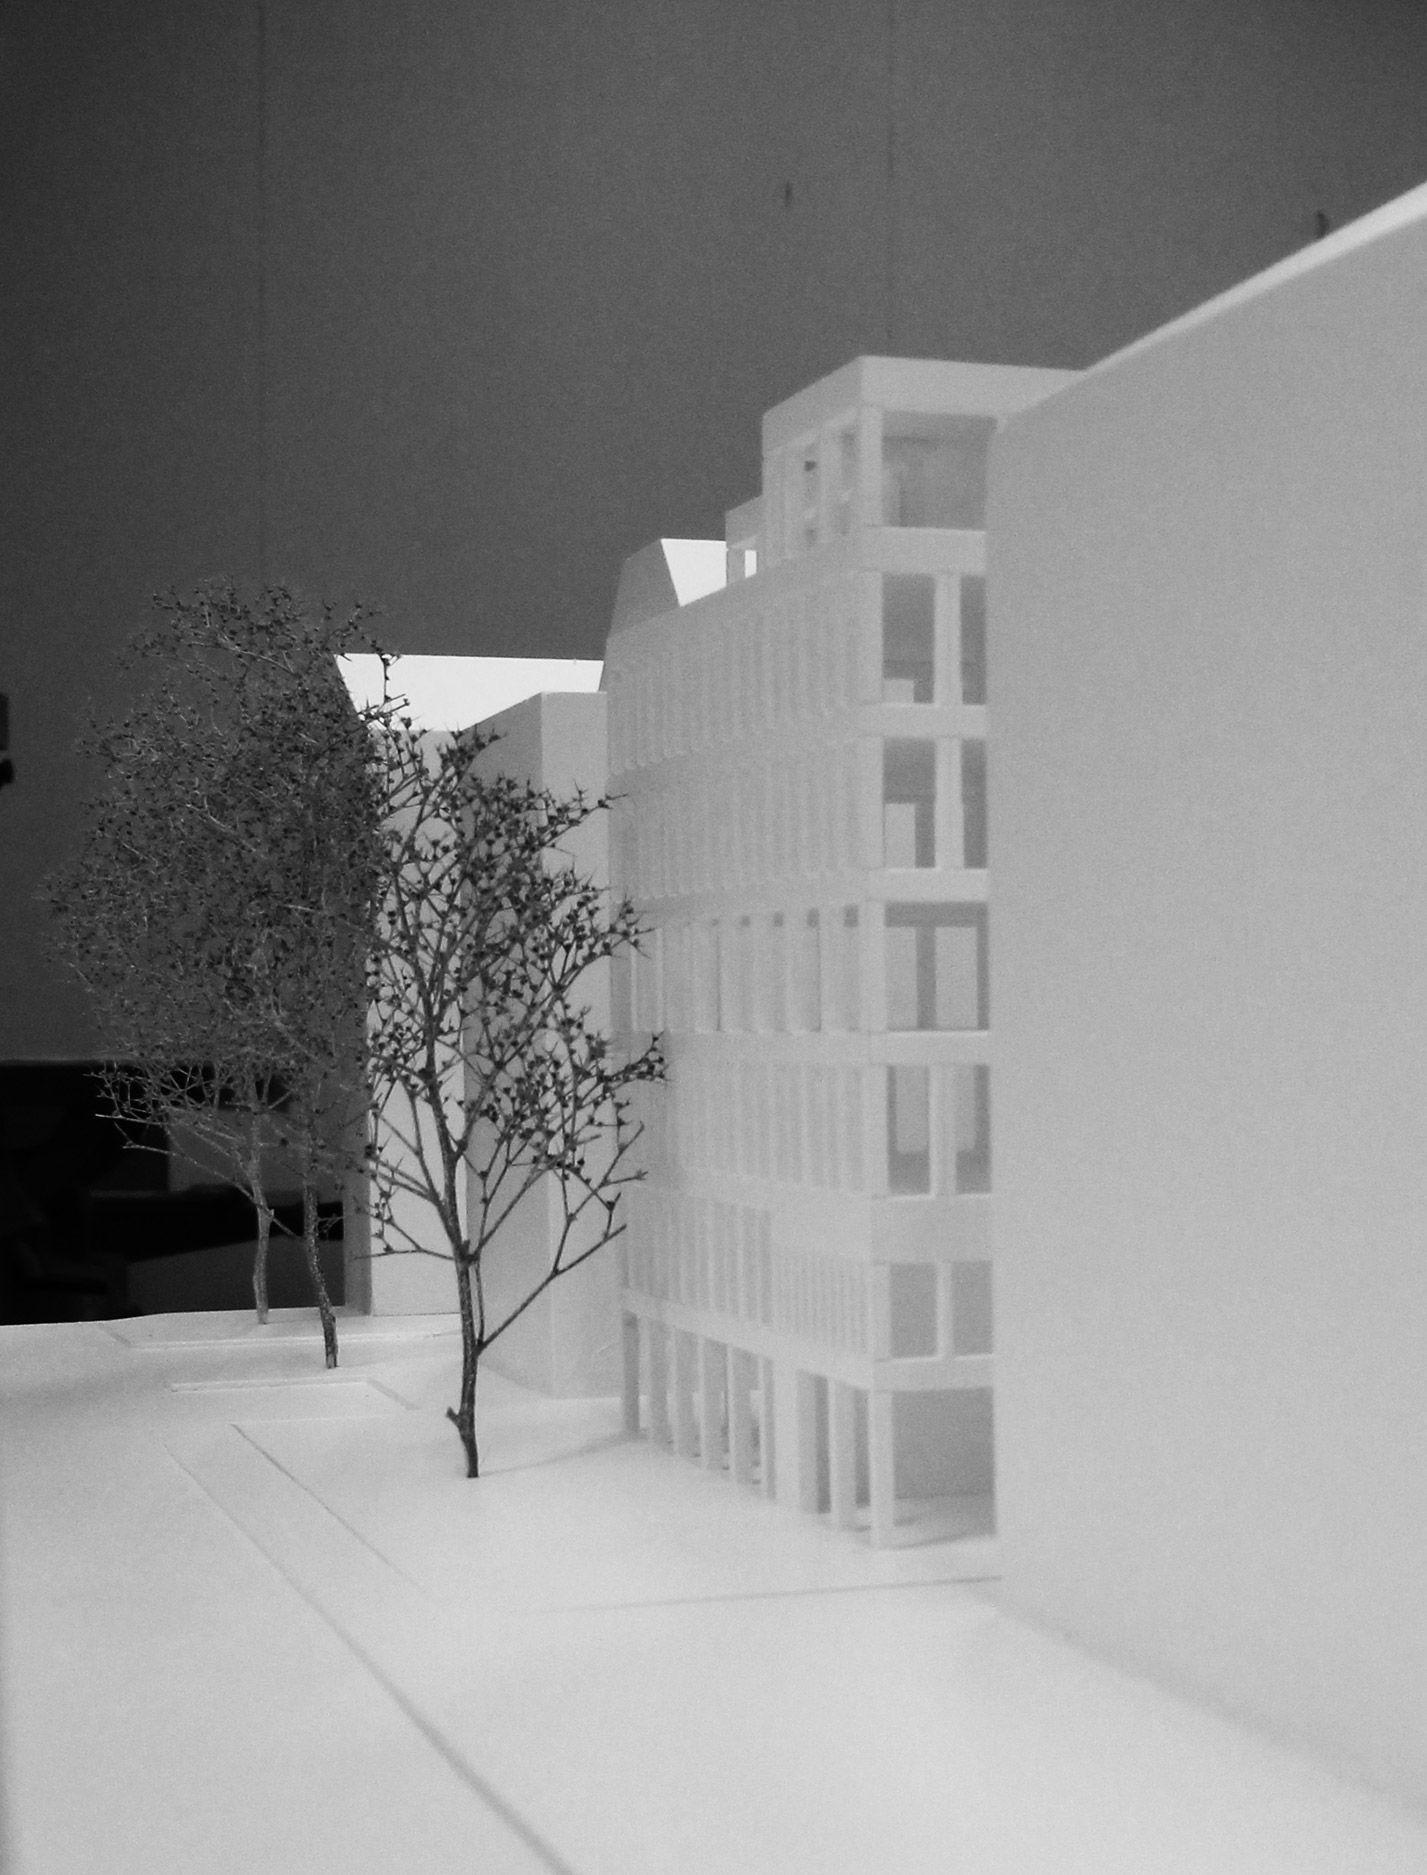 Office Building Claridenstrasse 35